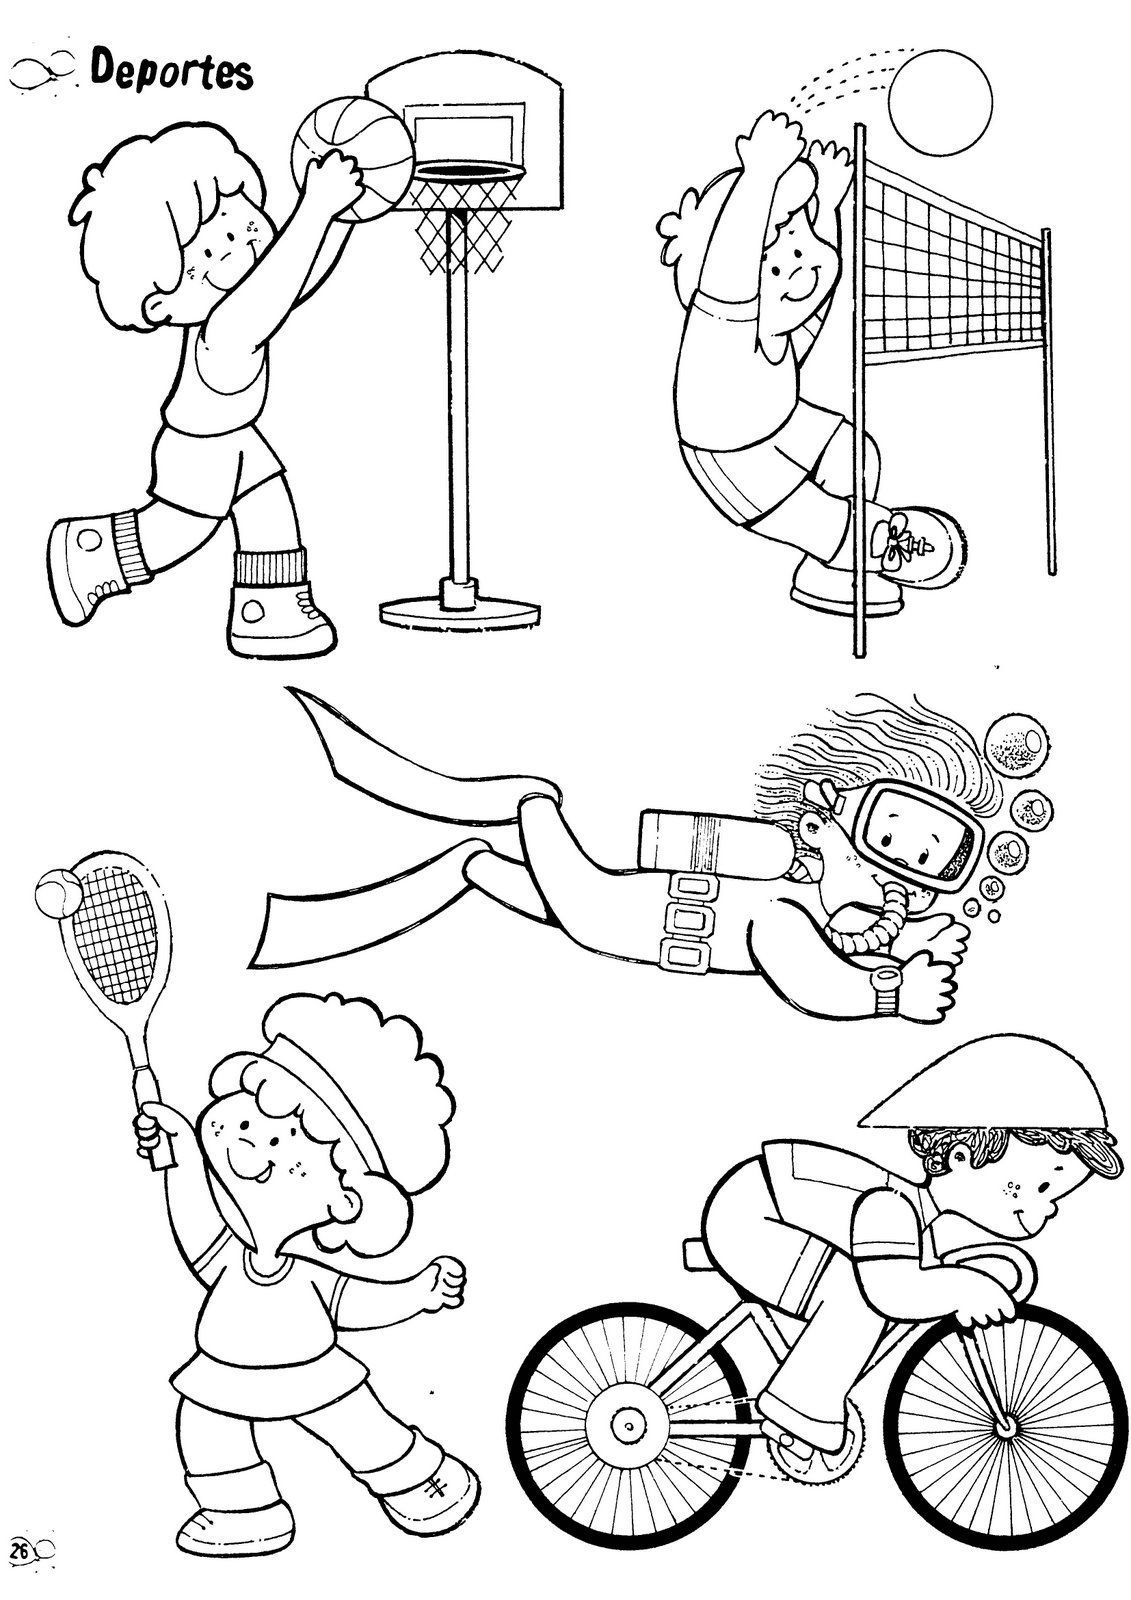 Картинки раскраски о спорте детские